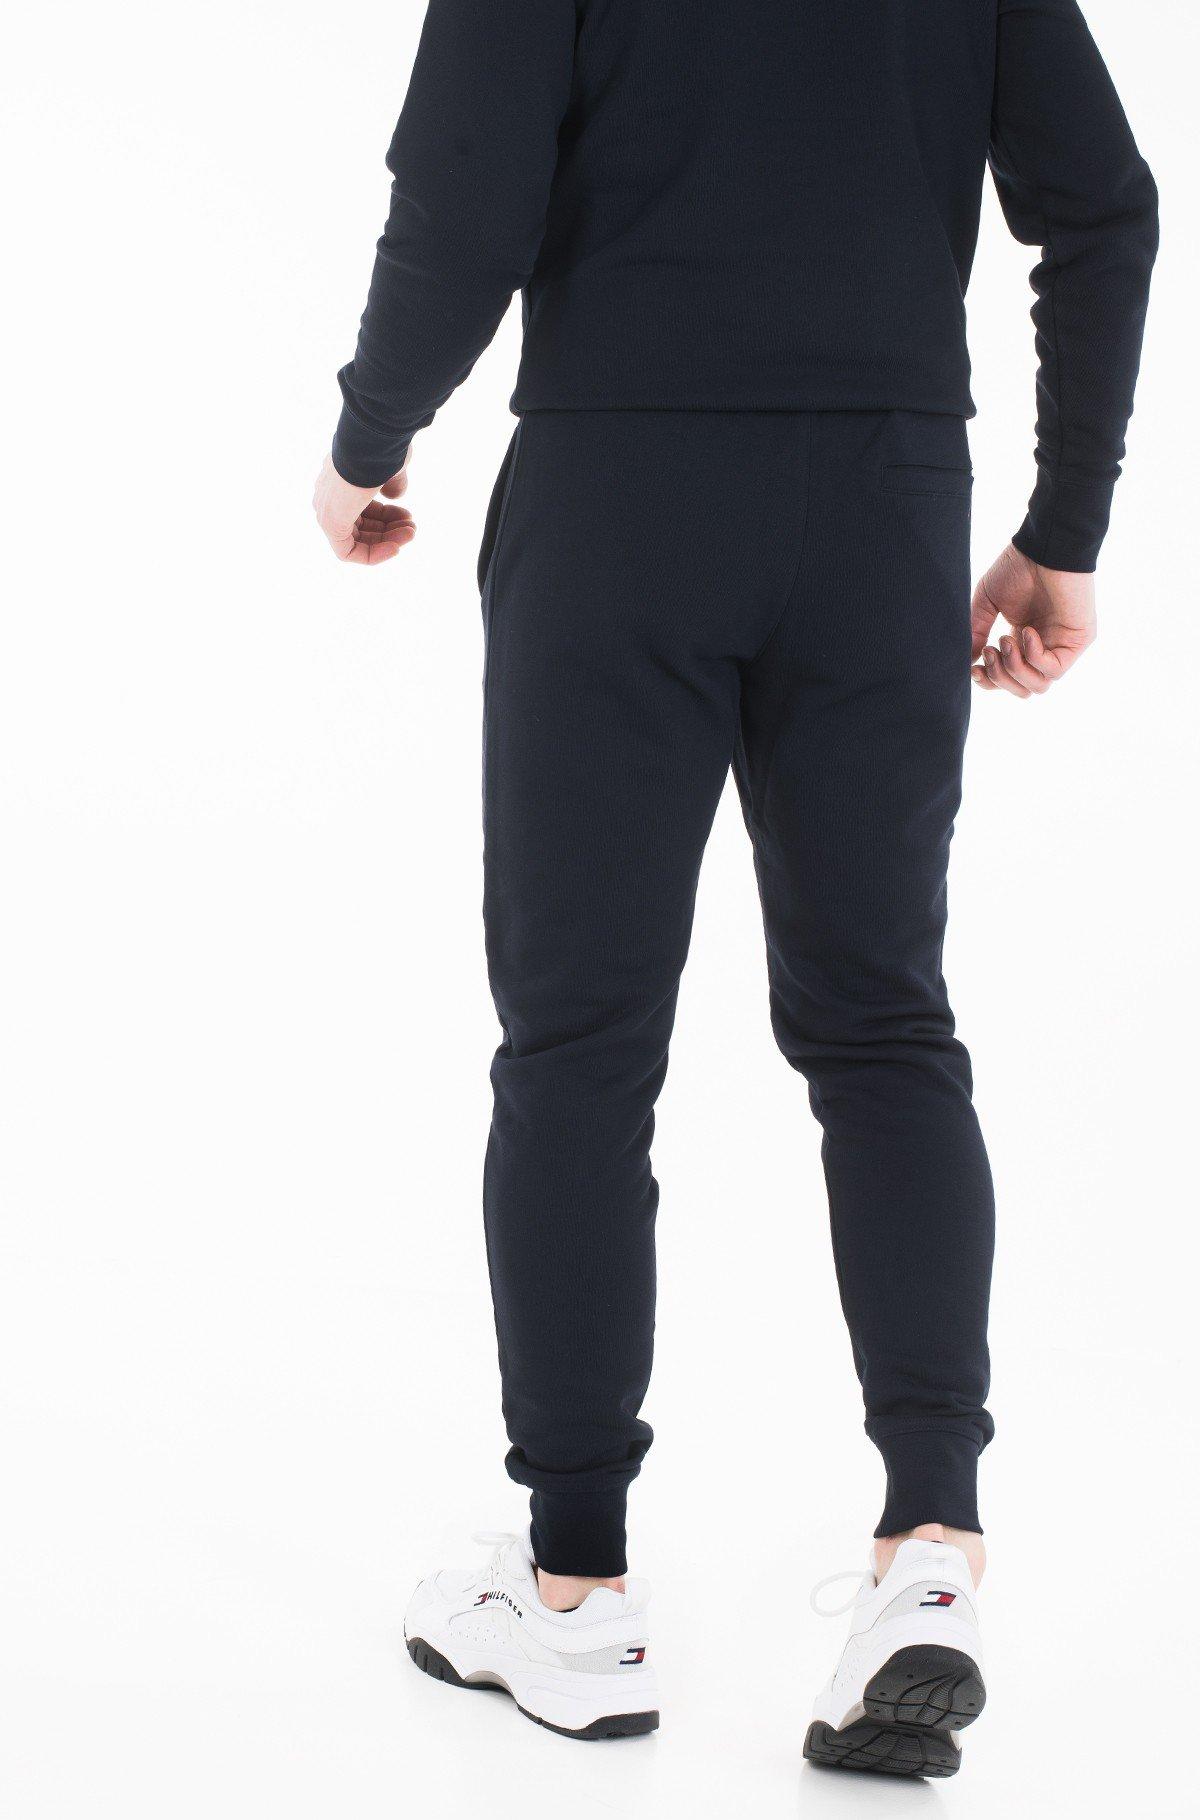 Sportinės kelnės BASIC EMBROIDERED SWEATPANTS-full-2